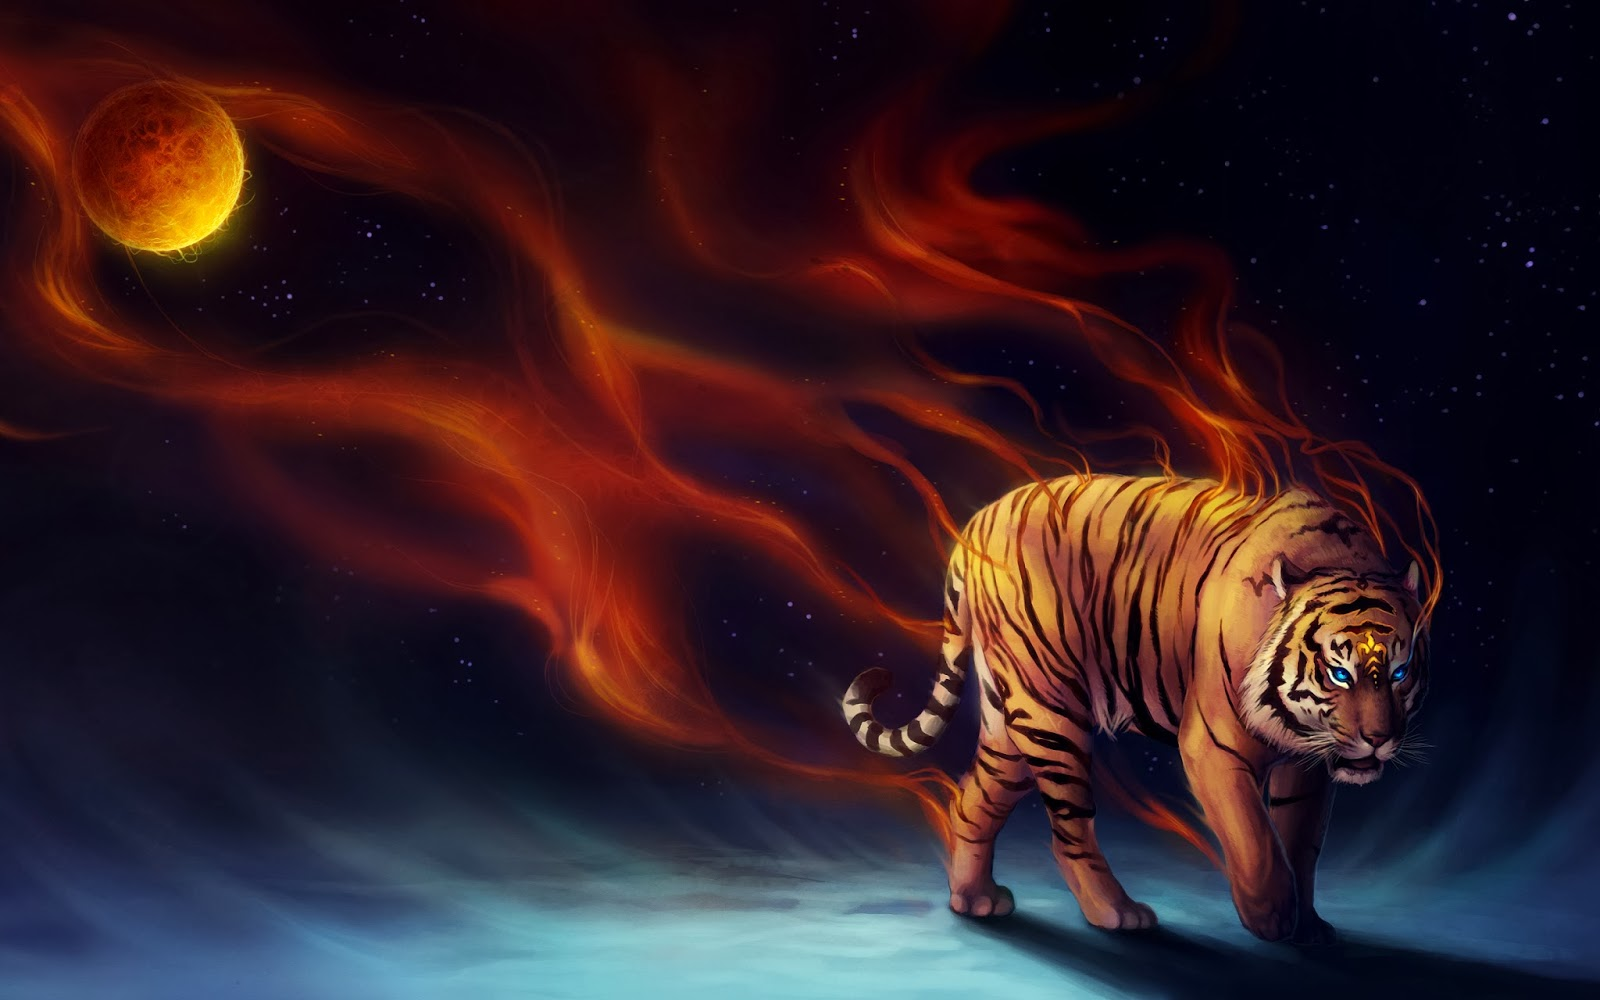 All New Wallpaper Tiger Hd Wallpapers